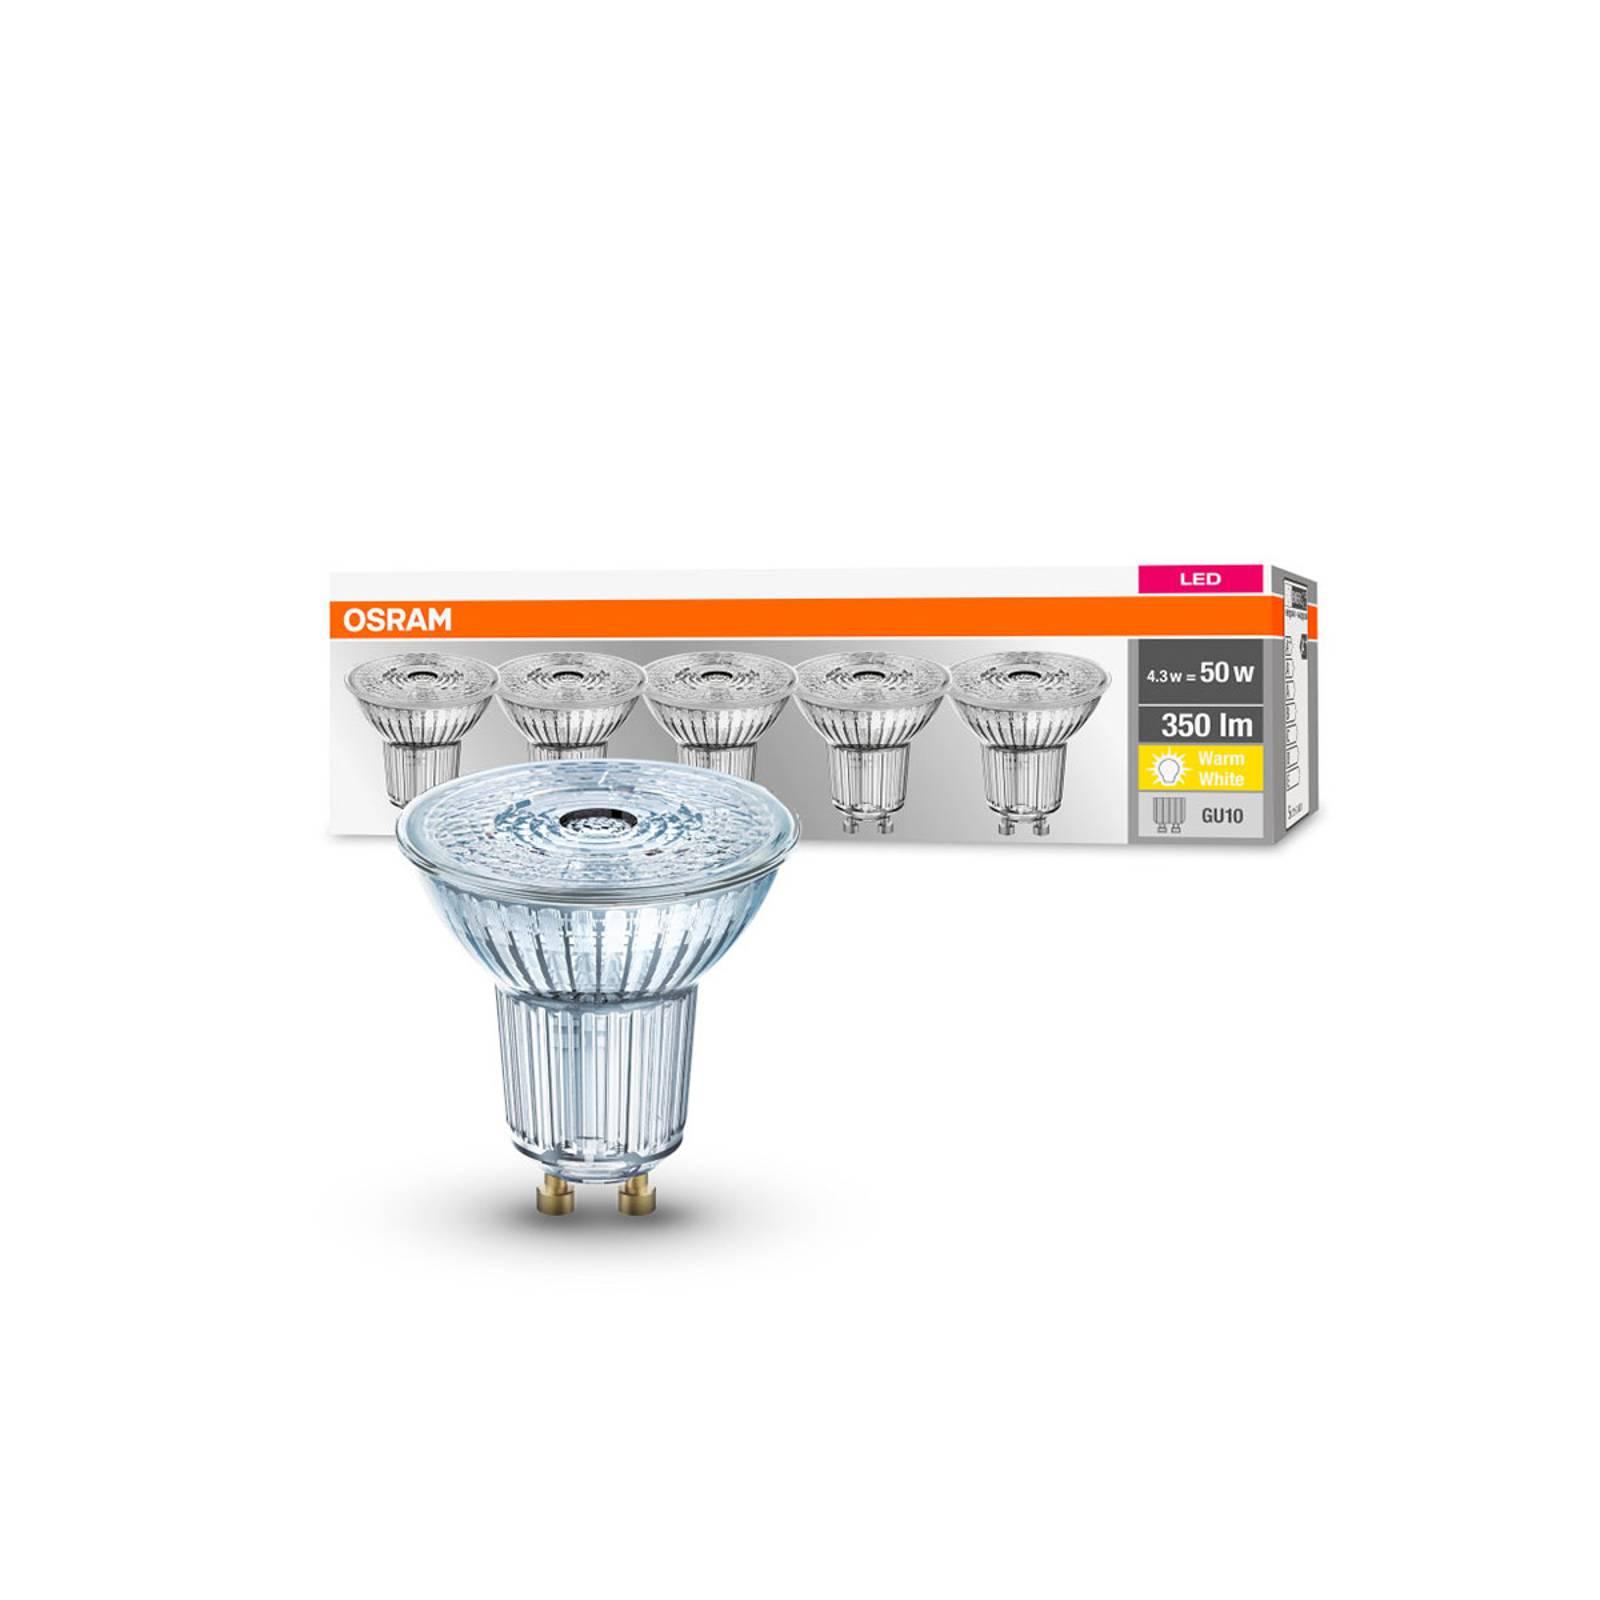 OSRAM-LED-heljastin GU10 4,3W 36° 2700K 350lm, 5